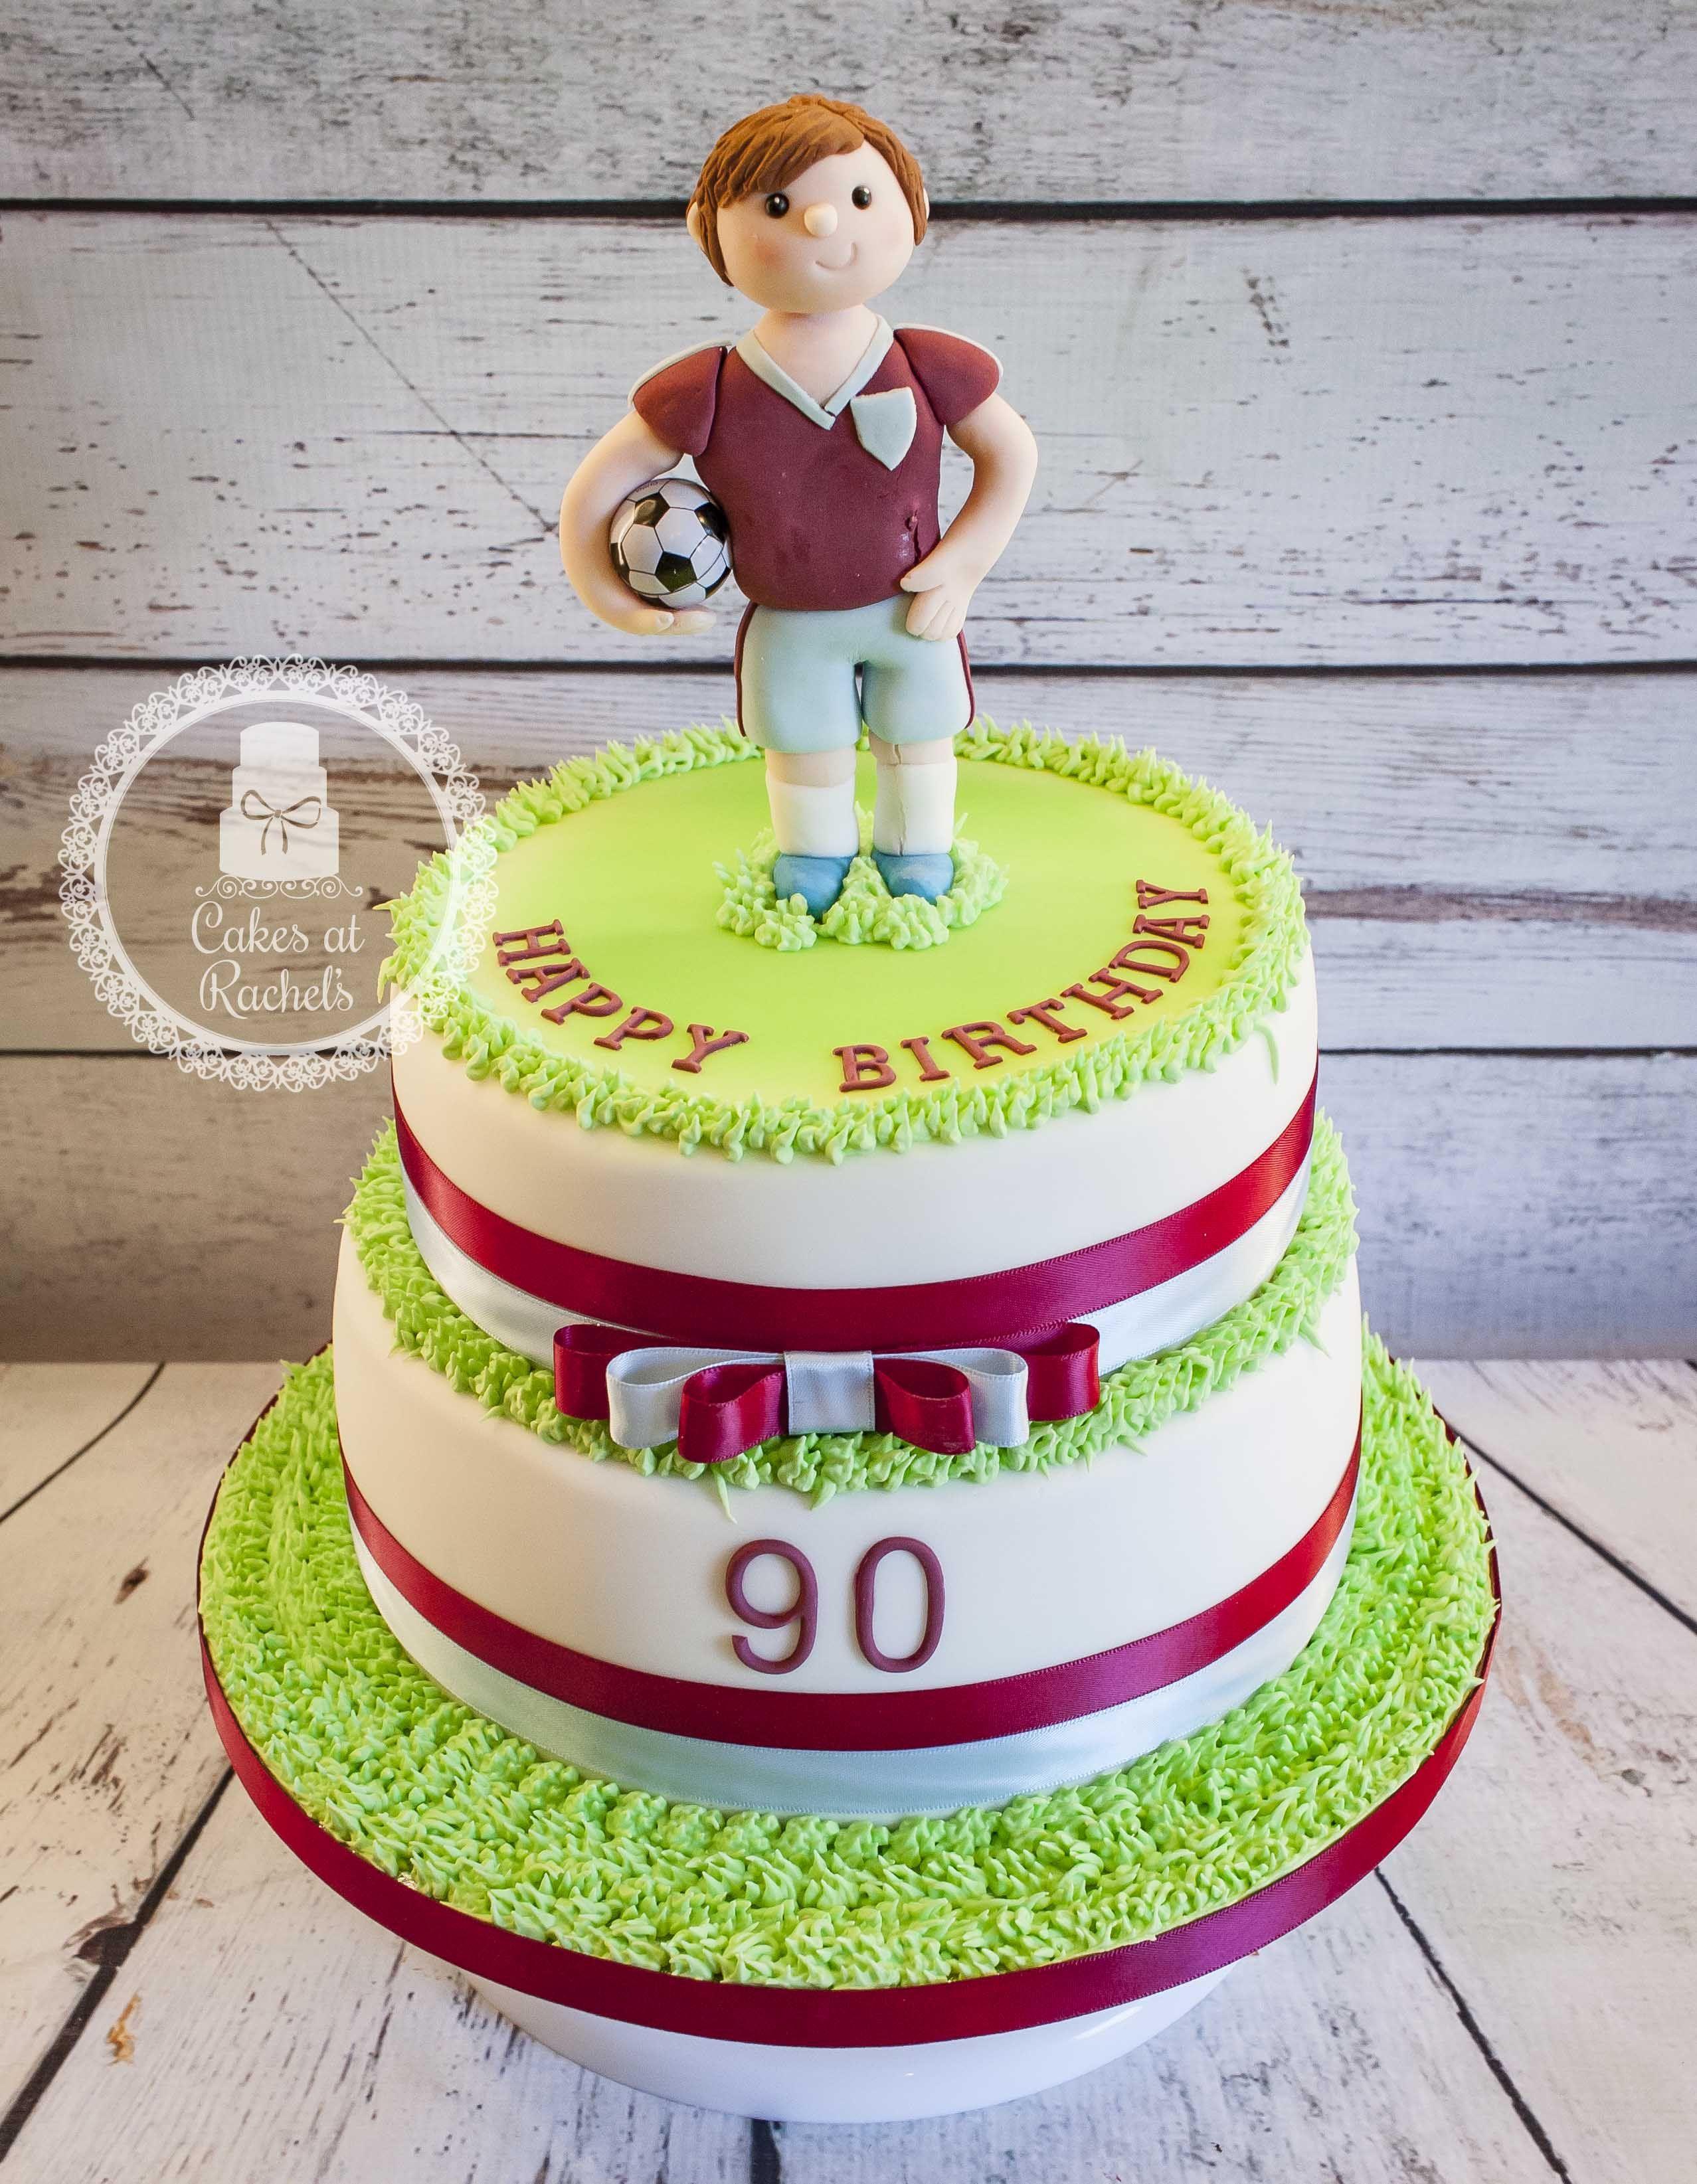 Burnley FC 90th birthday cake top tier rich fruit bottom tier